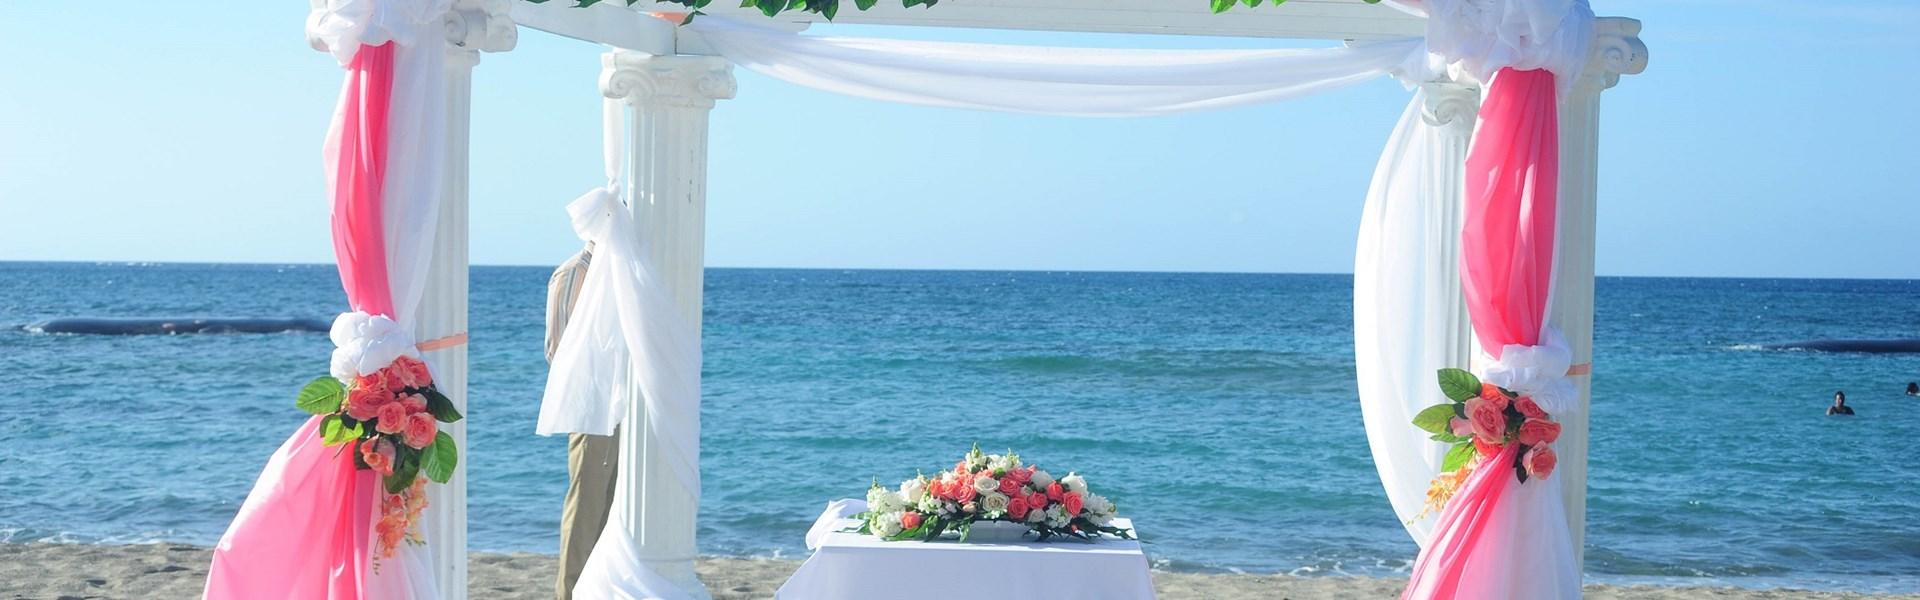 Grand Bahia Principe San Juan Wedding Venue